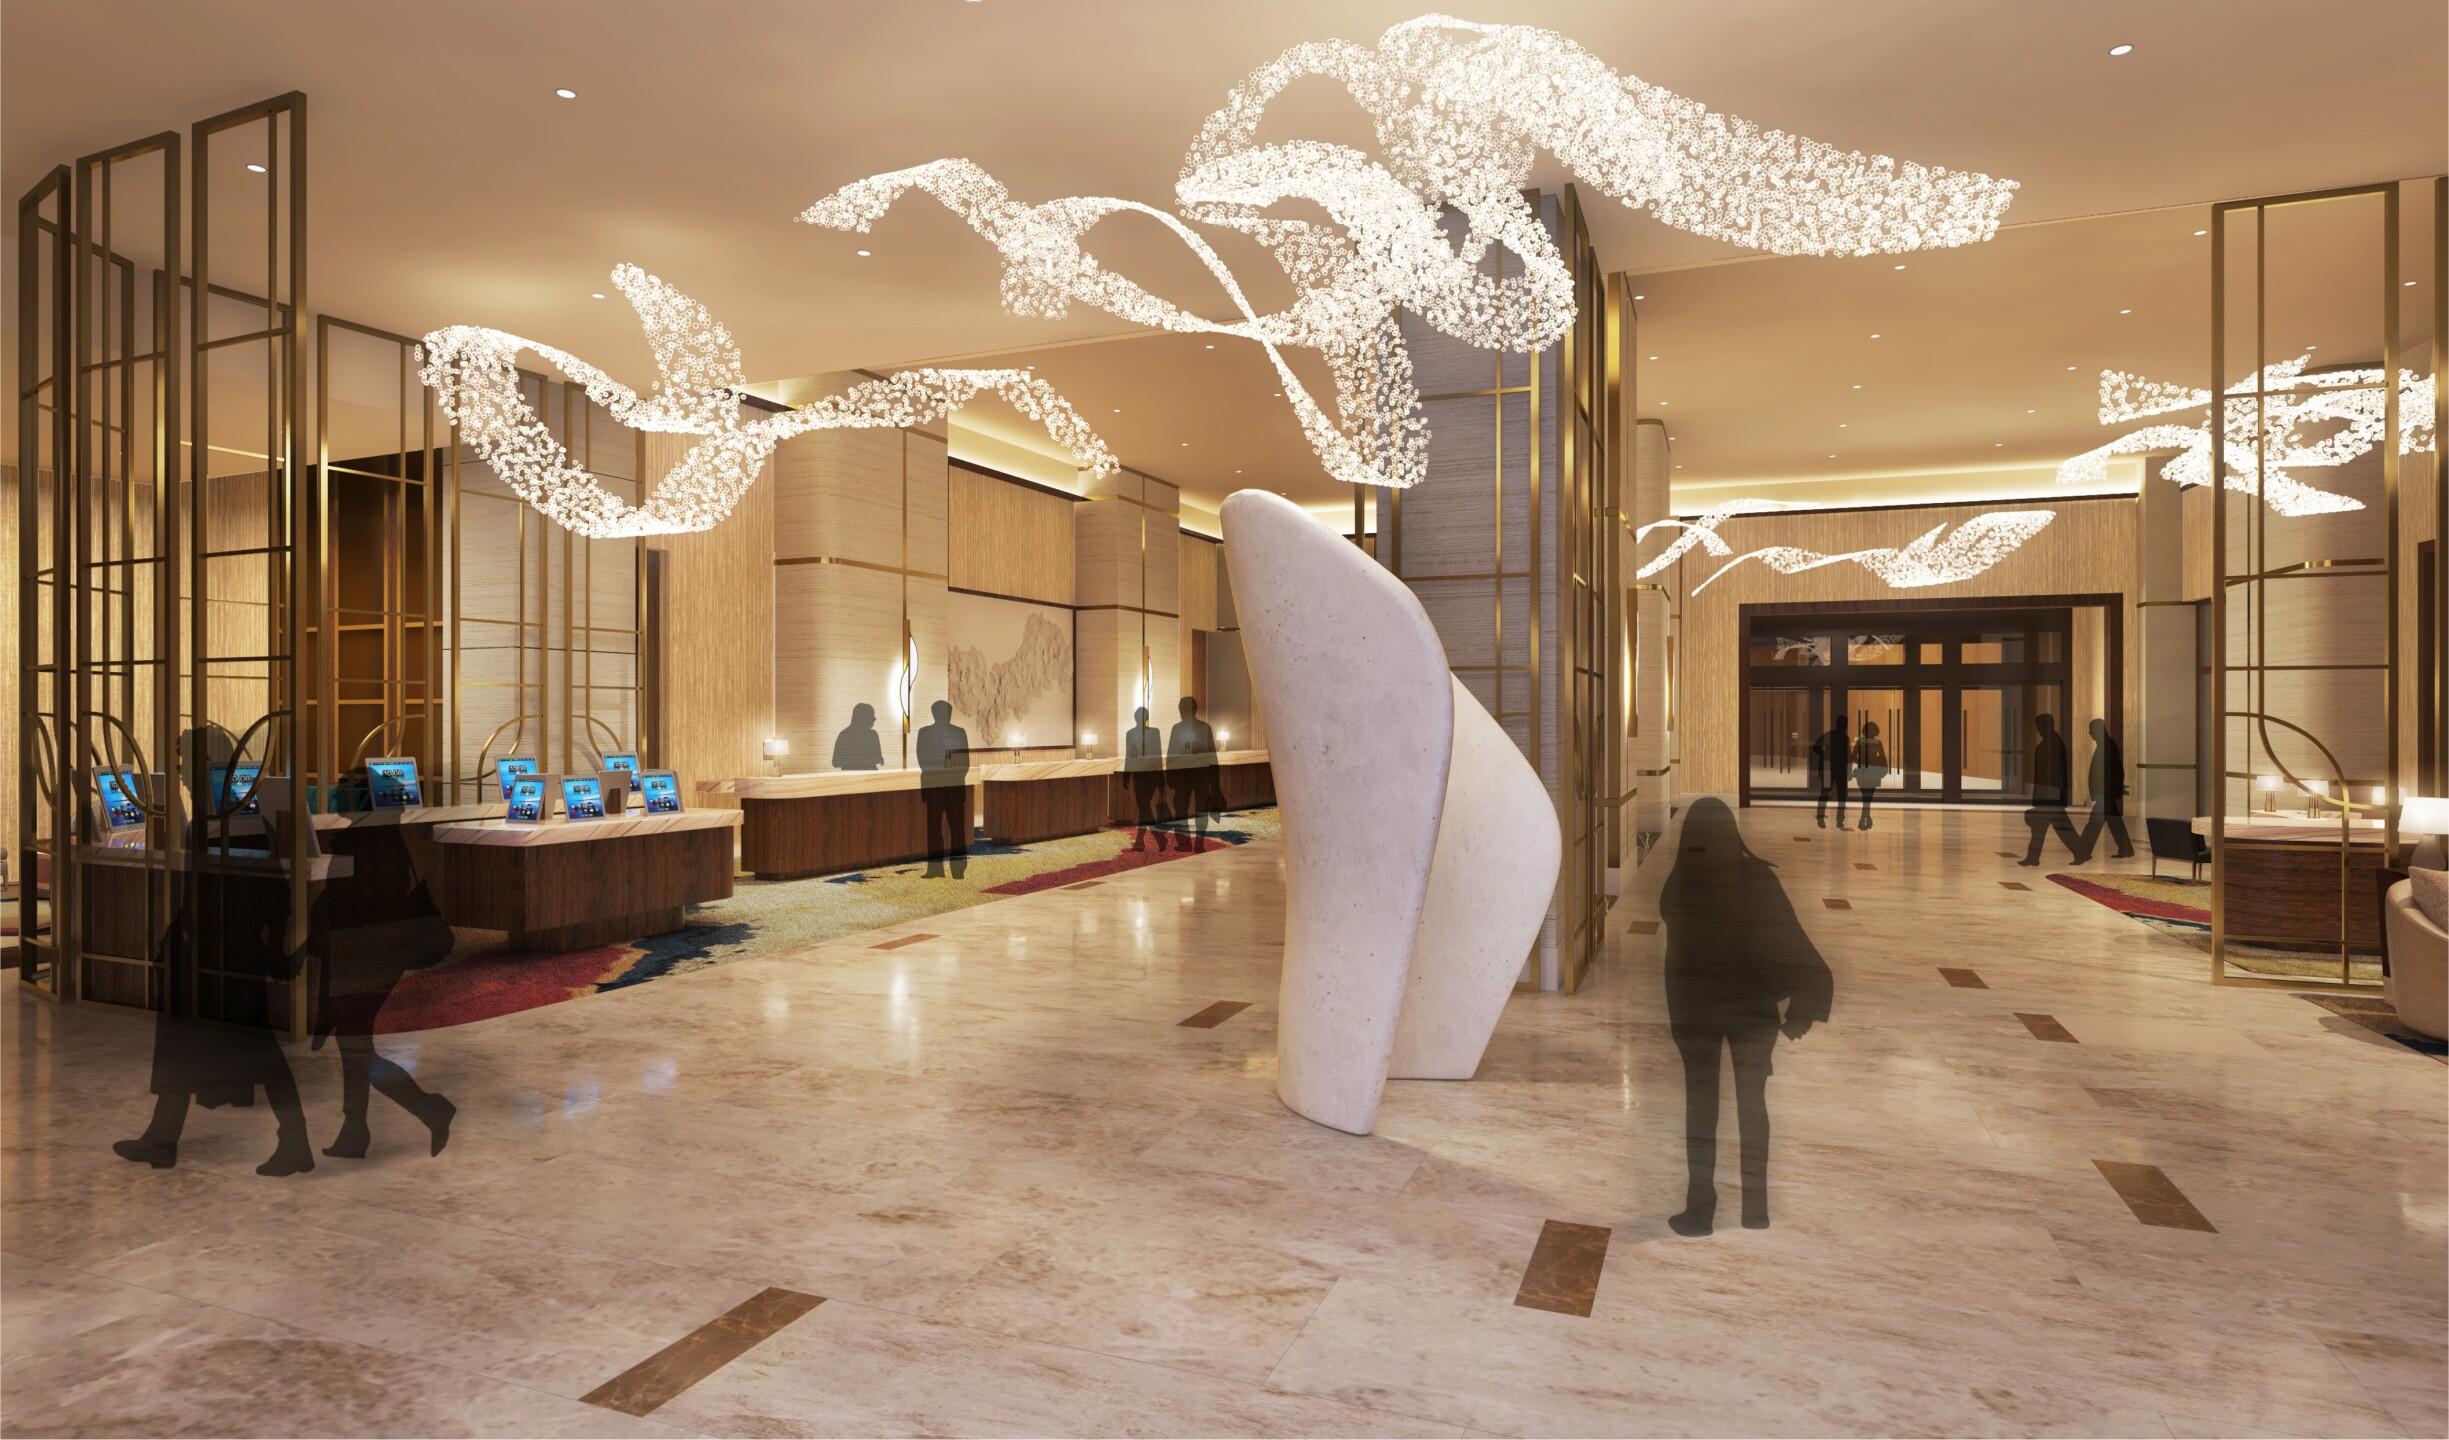 Las Vegas Hilton at Resorts World - Lobby Rendering.jpg